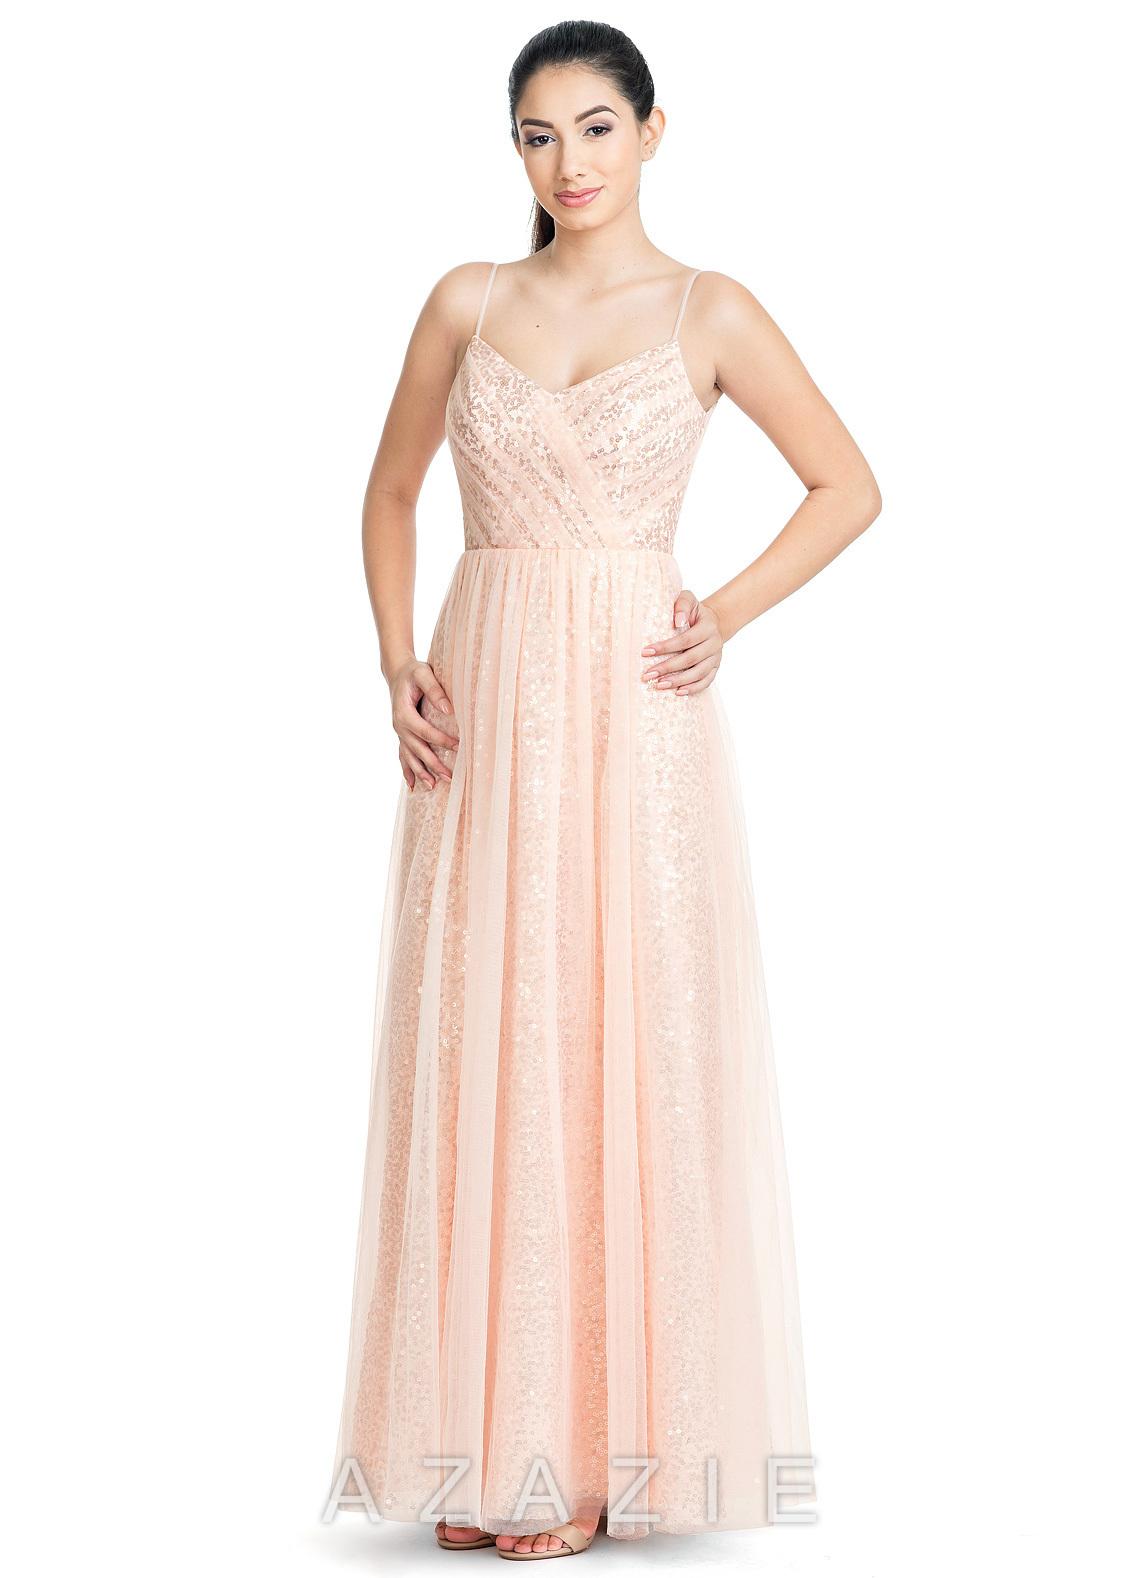 1acf10b947a3c Azazie Leilani Bridesmaid Dress | Azazie